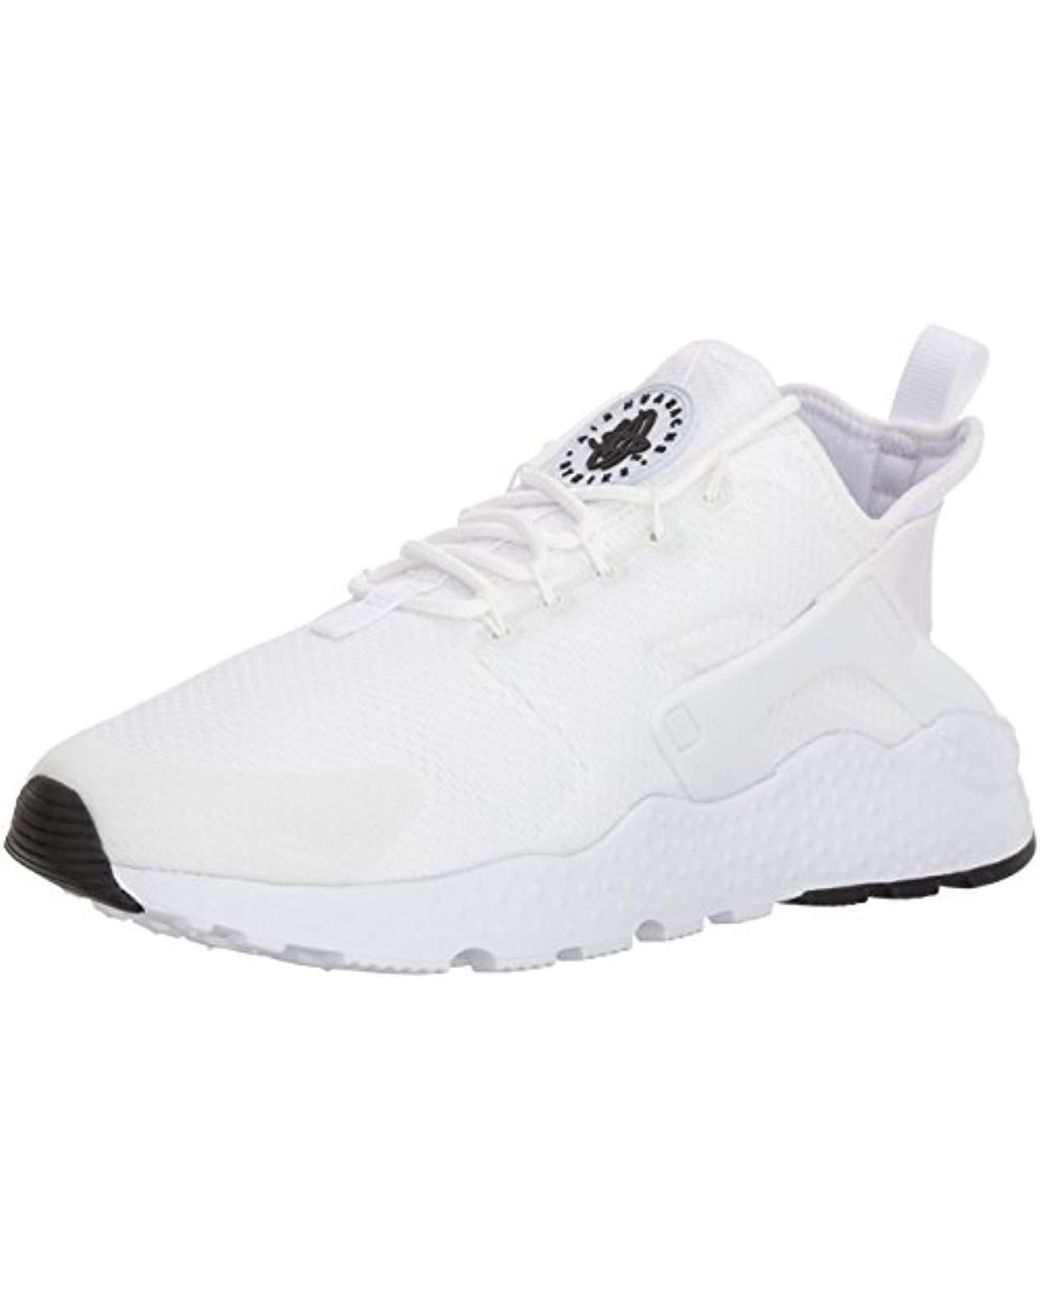 Nike W Air Huarache Run Ultra white white white black